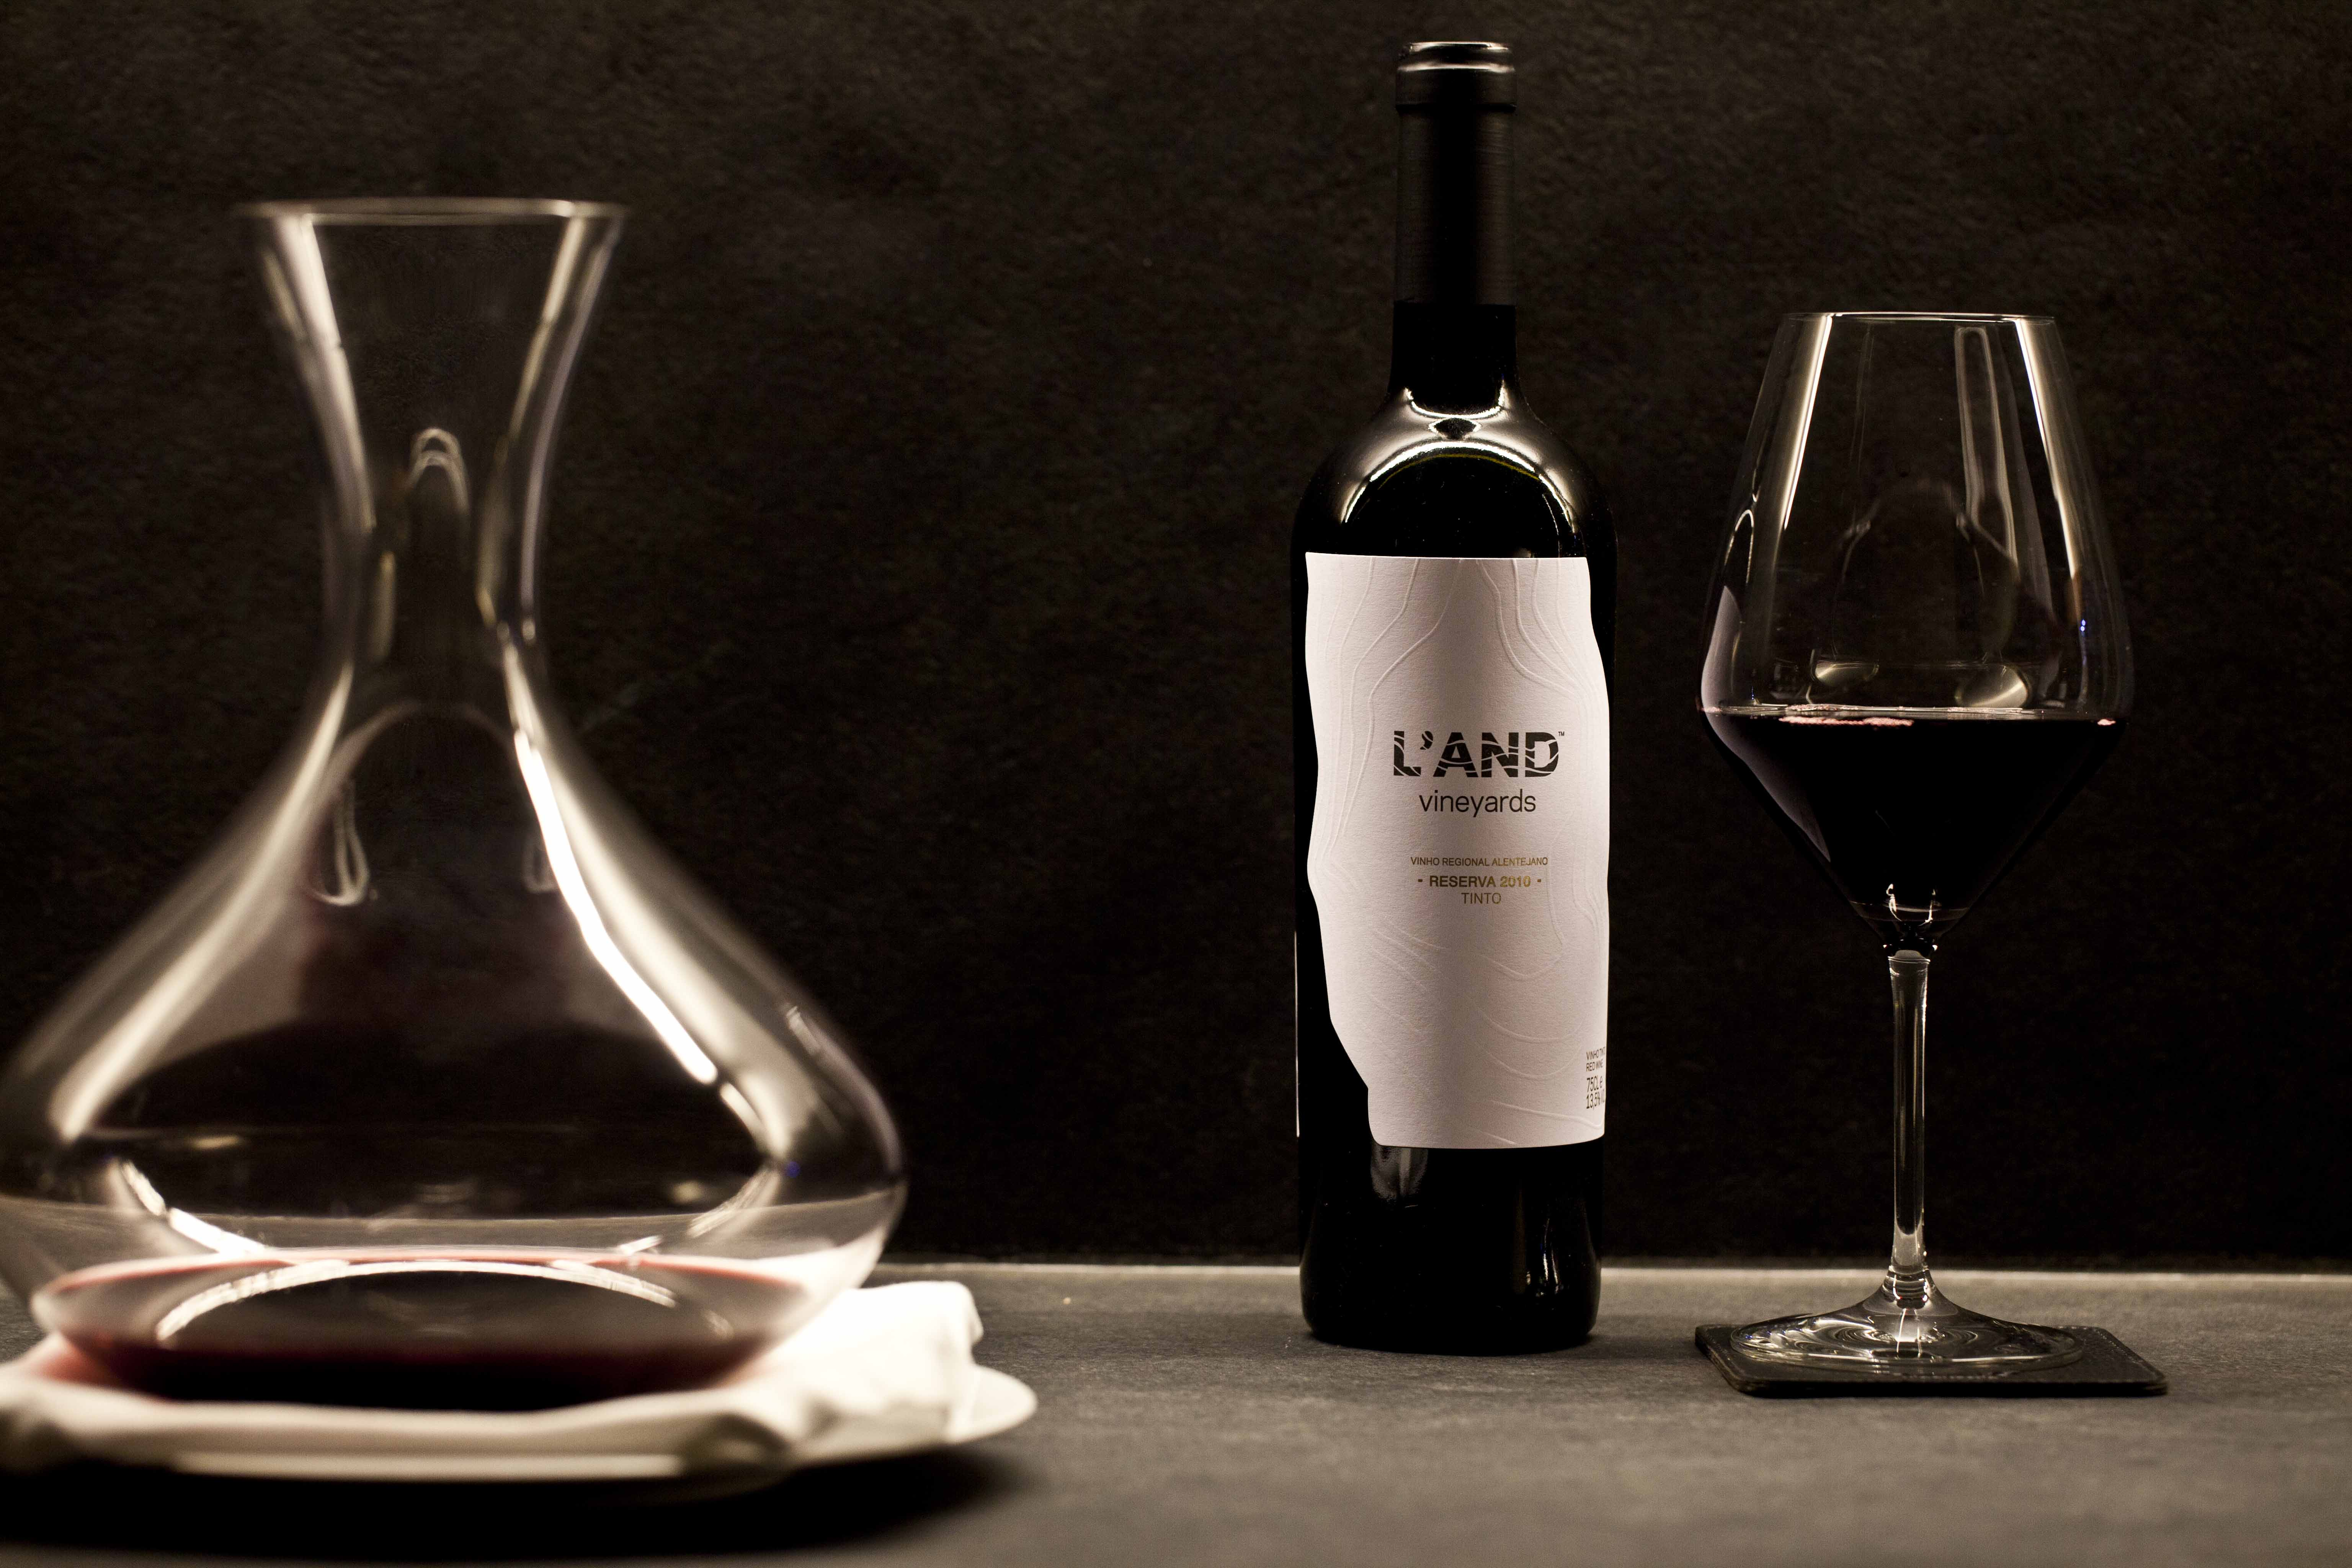 LAND wine